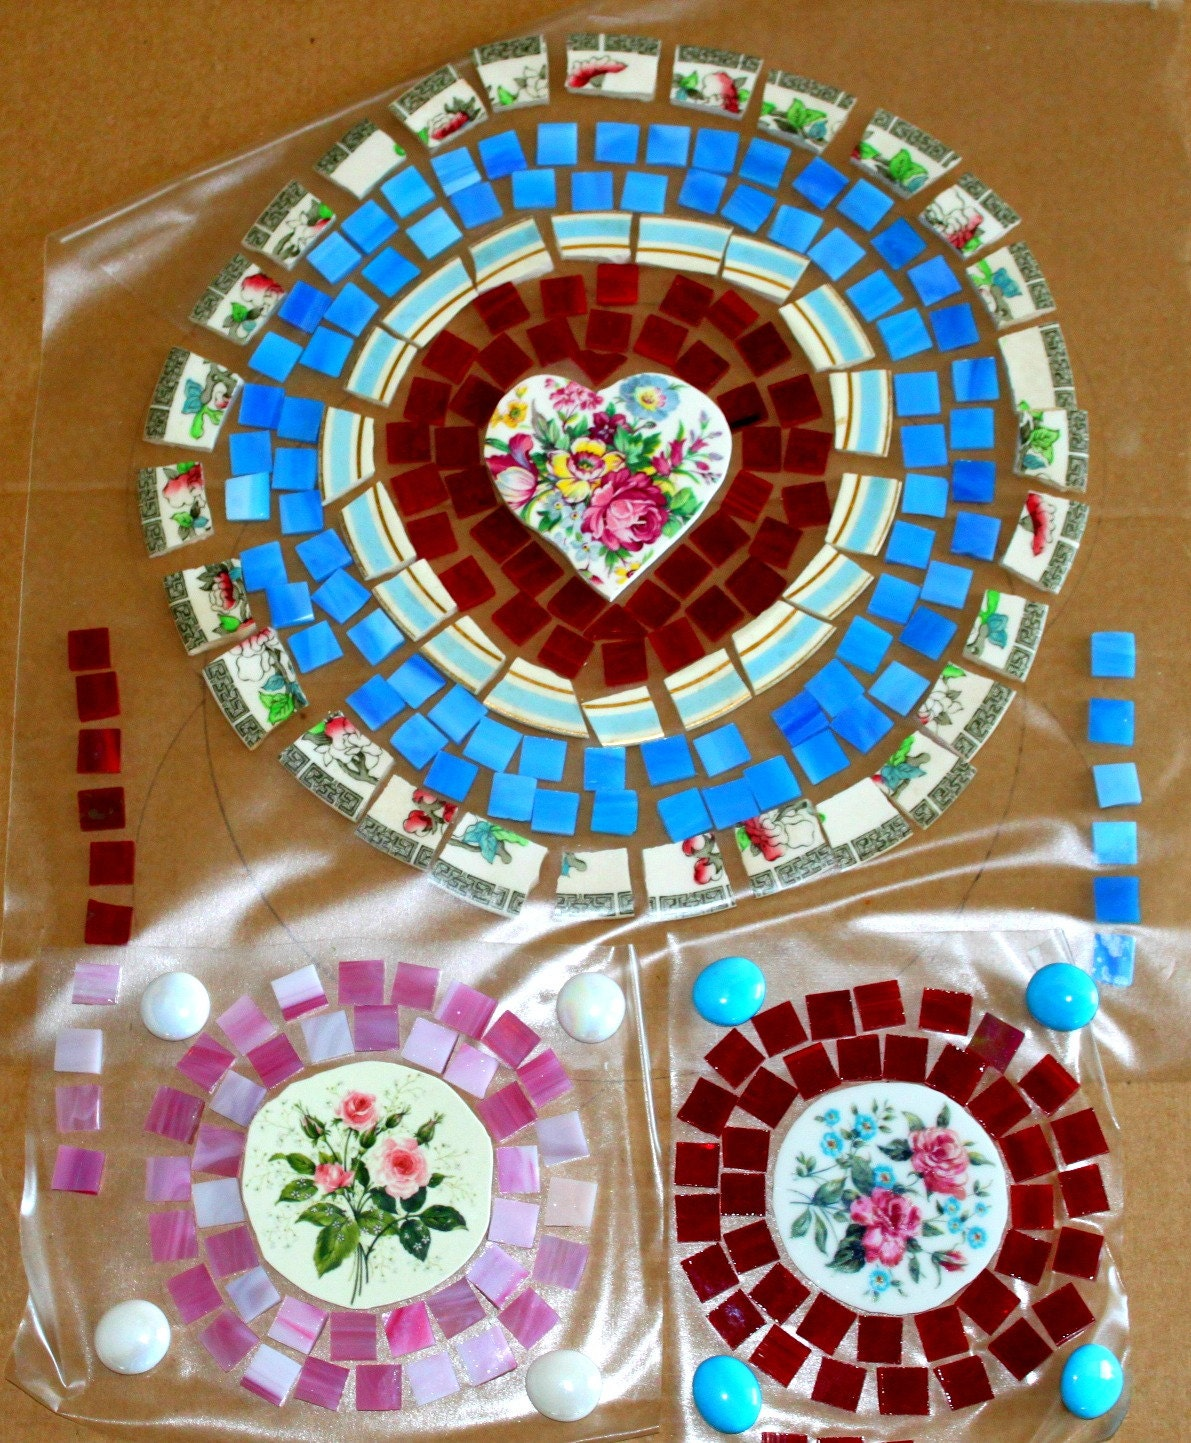 Mosaic Tile Focals Broken Plates Table Top Set Romantic